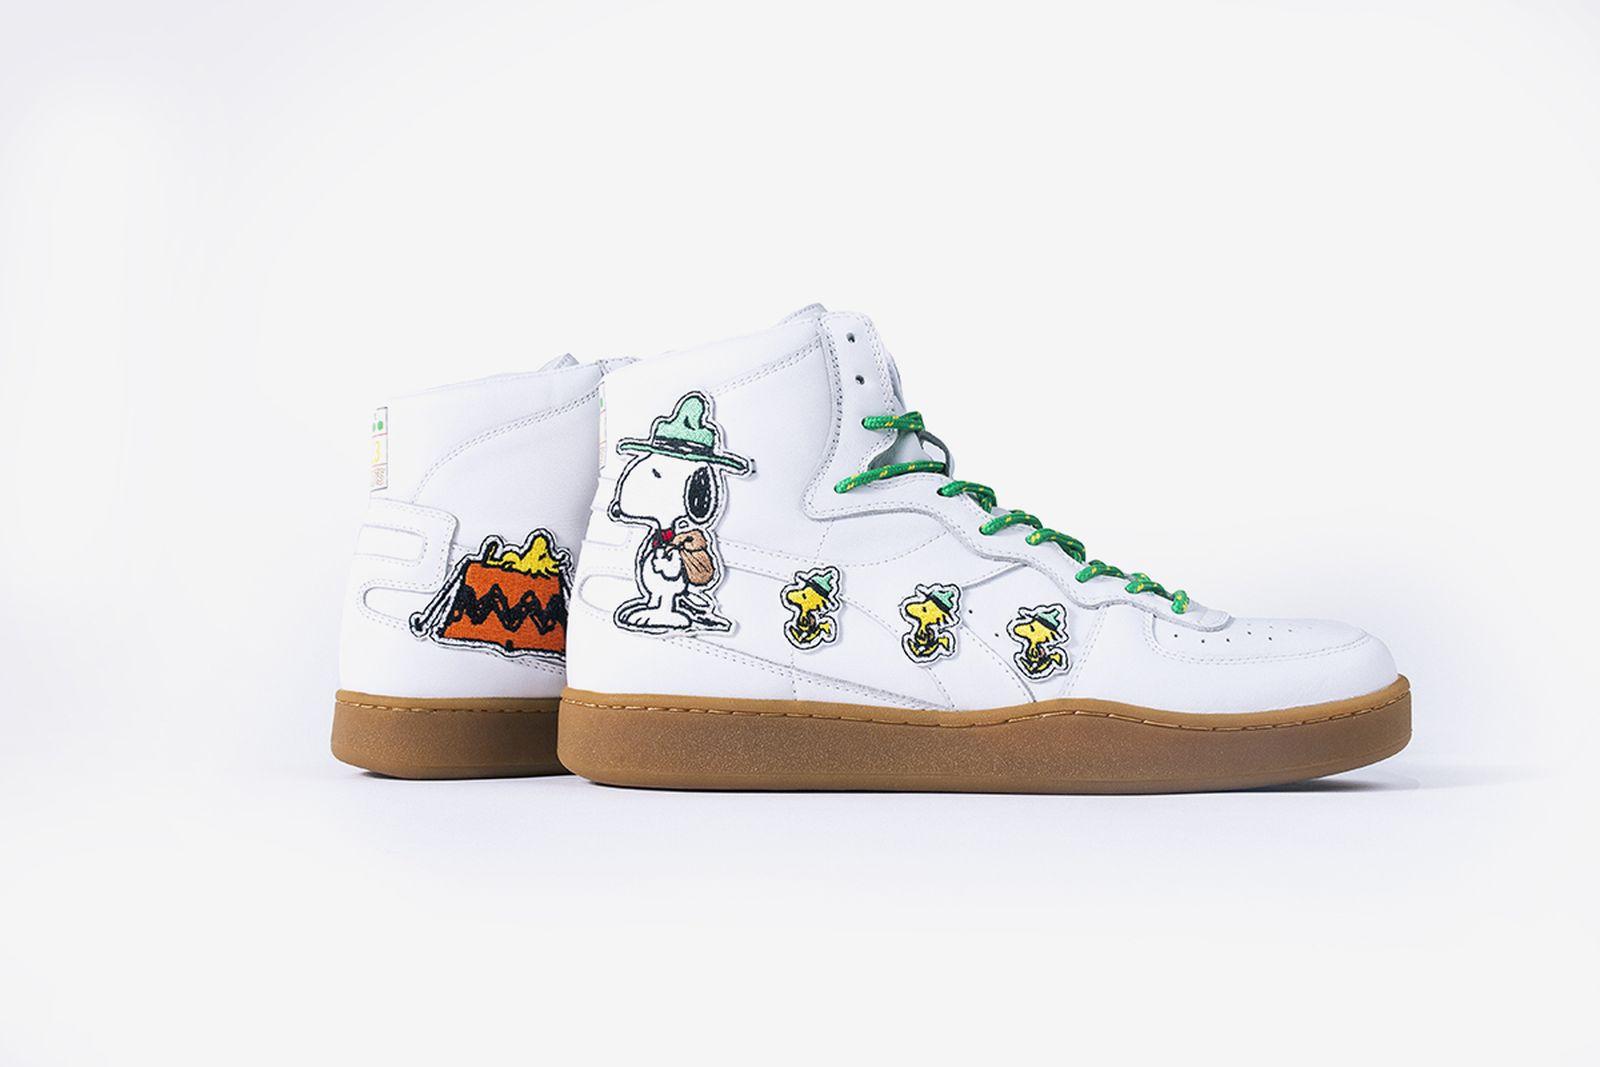 lc23 diadora peanuts sneakers release date price Diadora Mi Basket diadora b elite